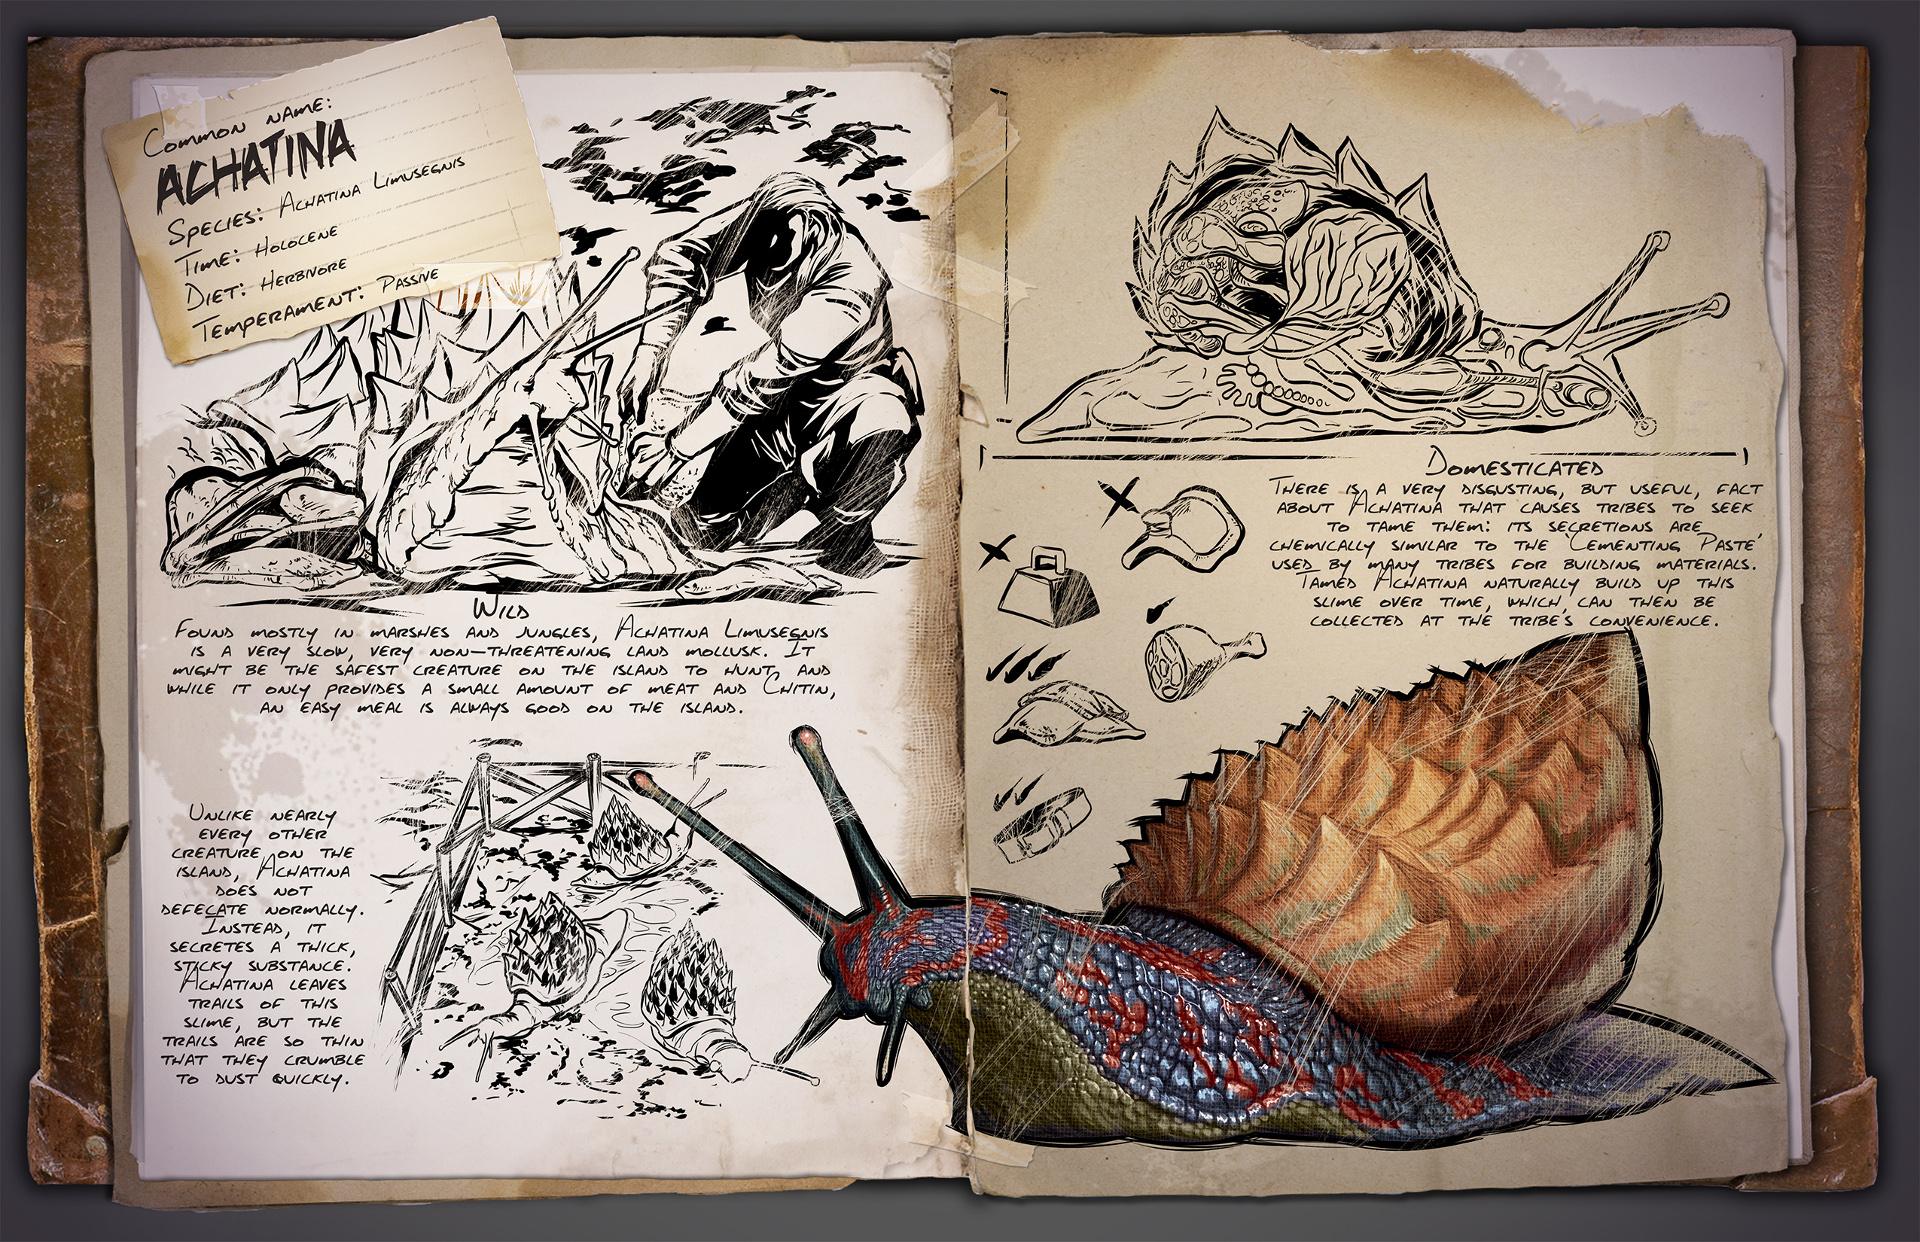 Dino Dossier: Achatina – Snail